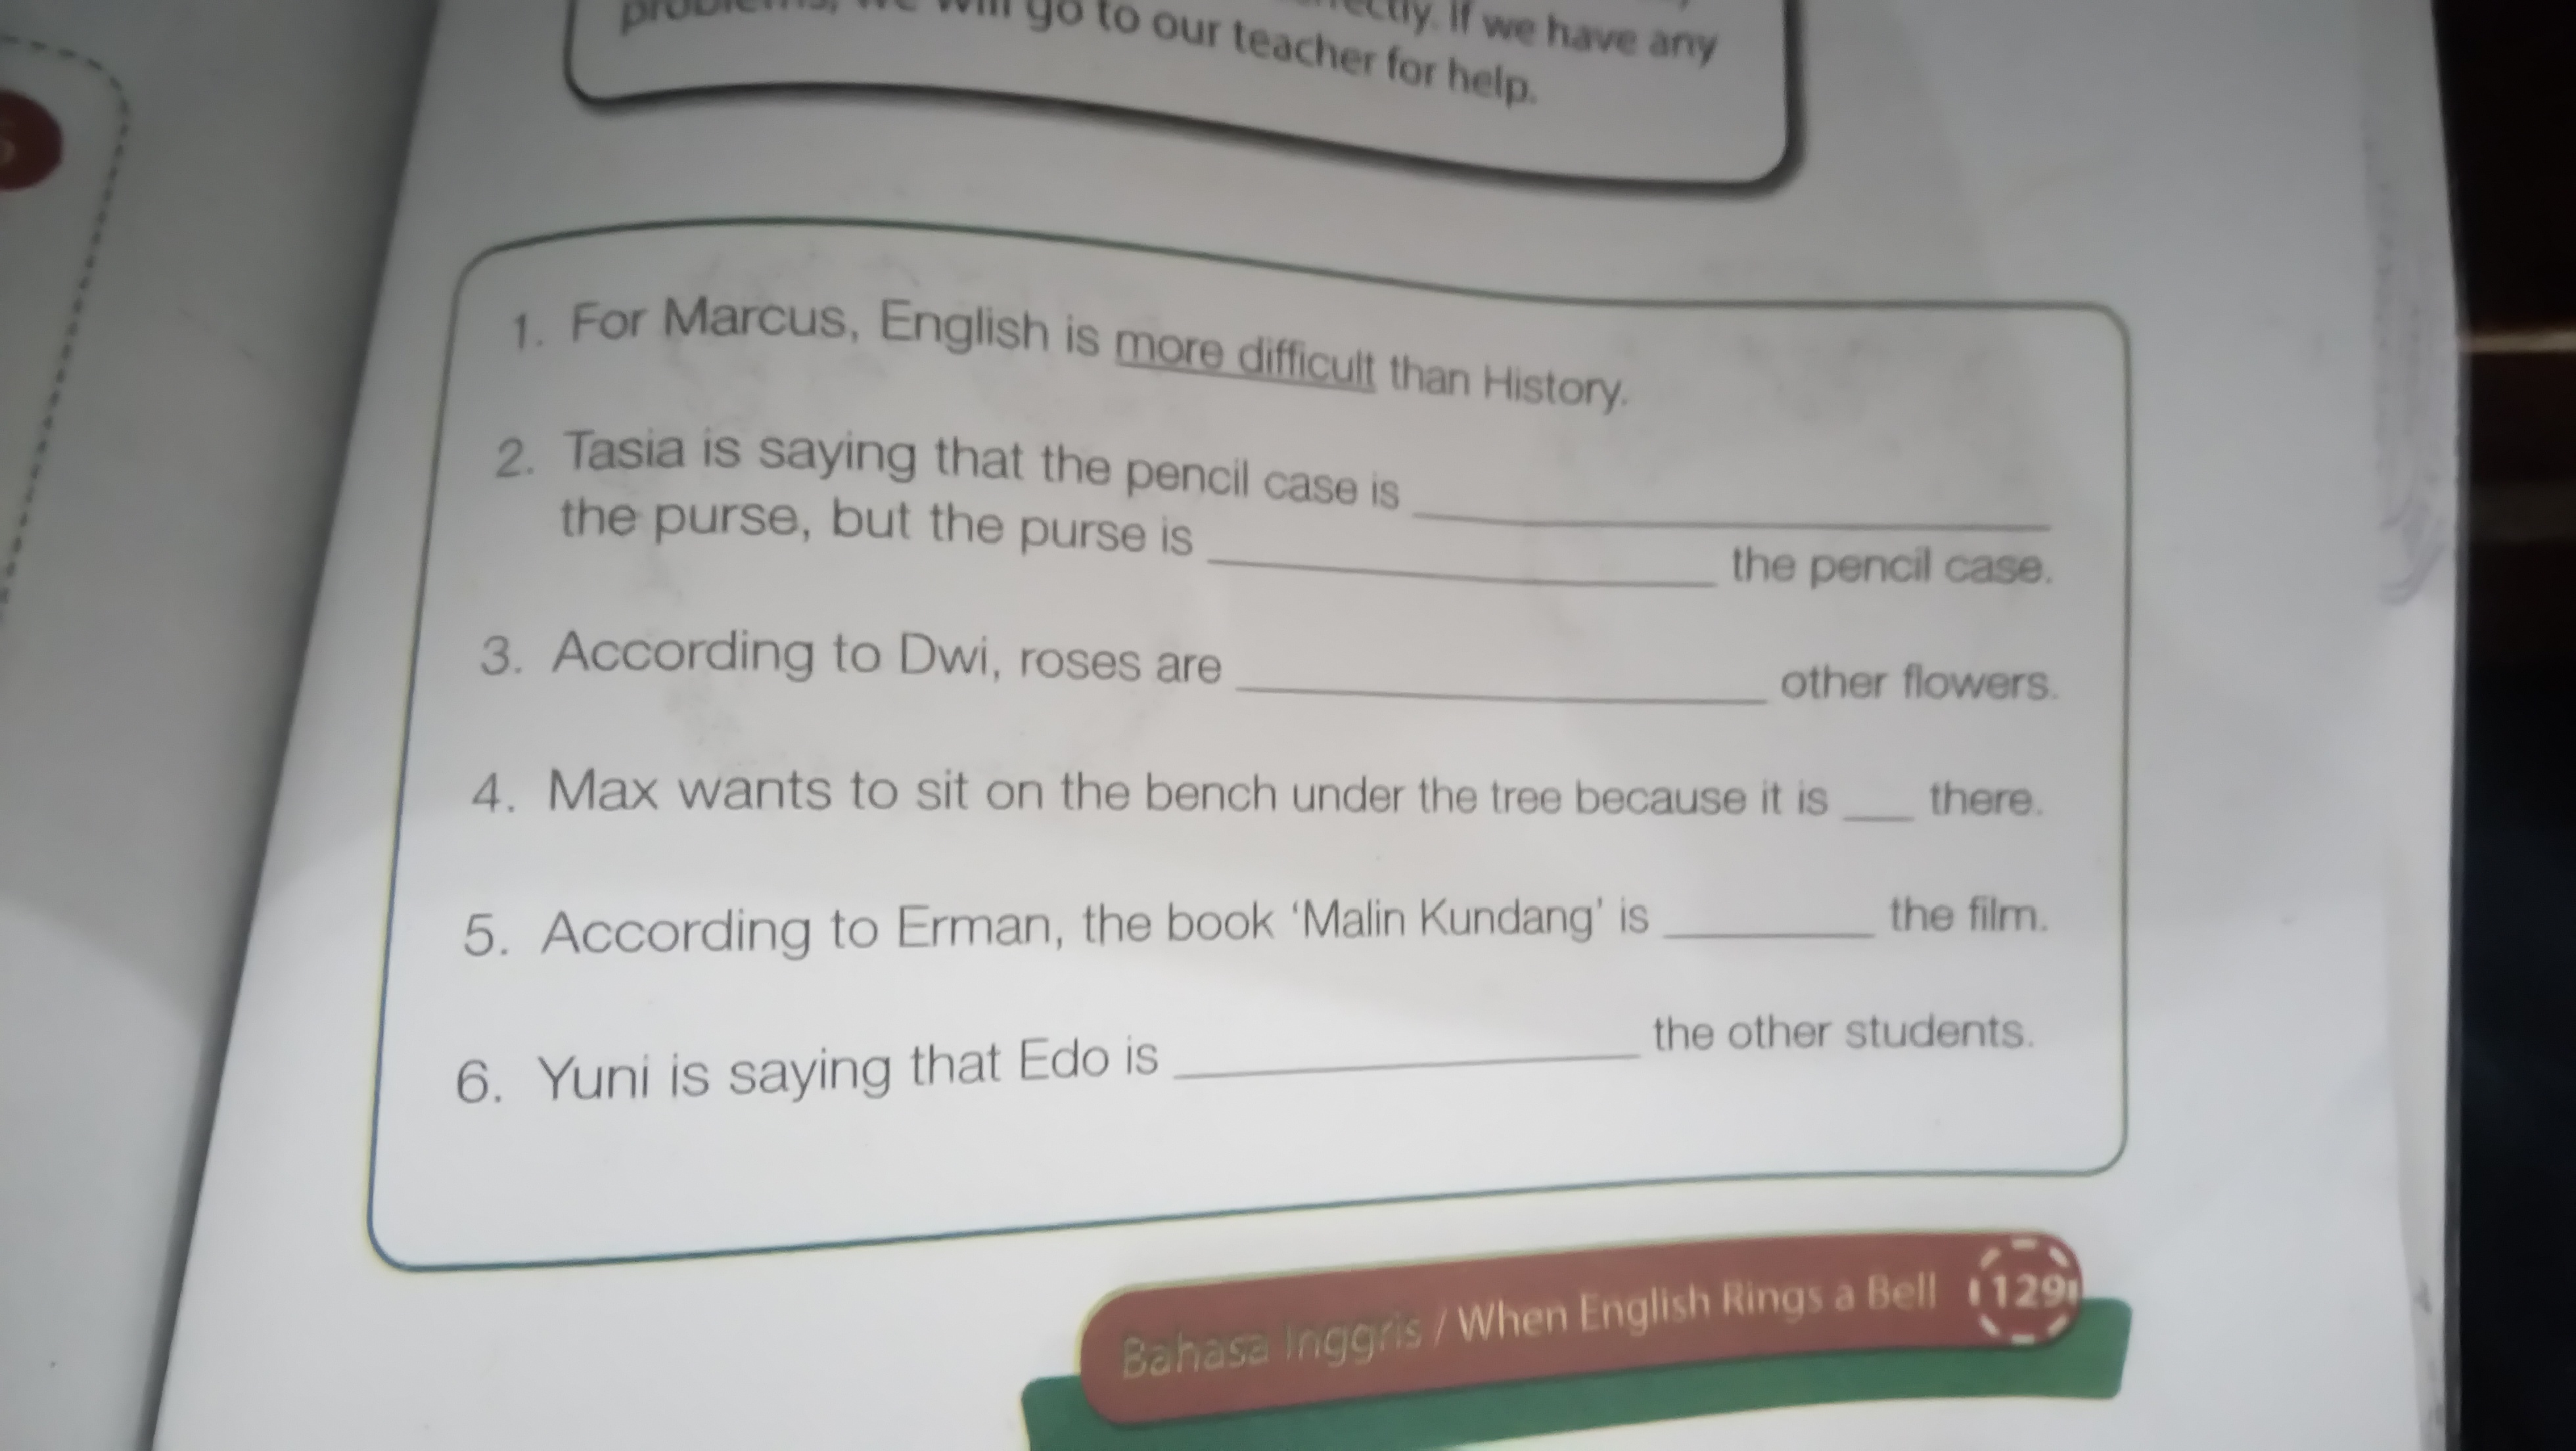 Tolong Dong Bahasa Inggris Kelas 8 Kurikulum 2013 Halaman 129 Pliss Tolong Bantu Ya Kk Brainly Co Id